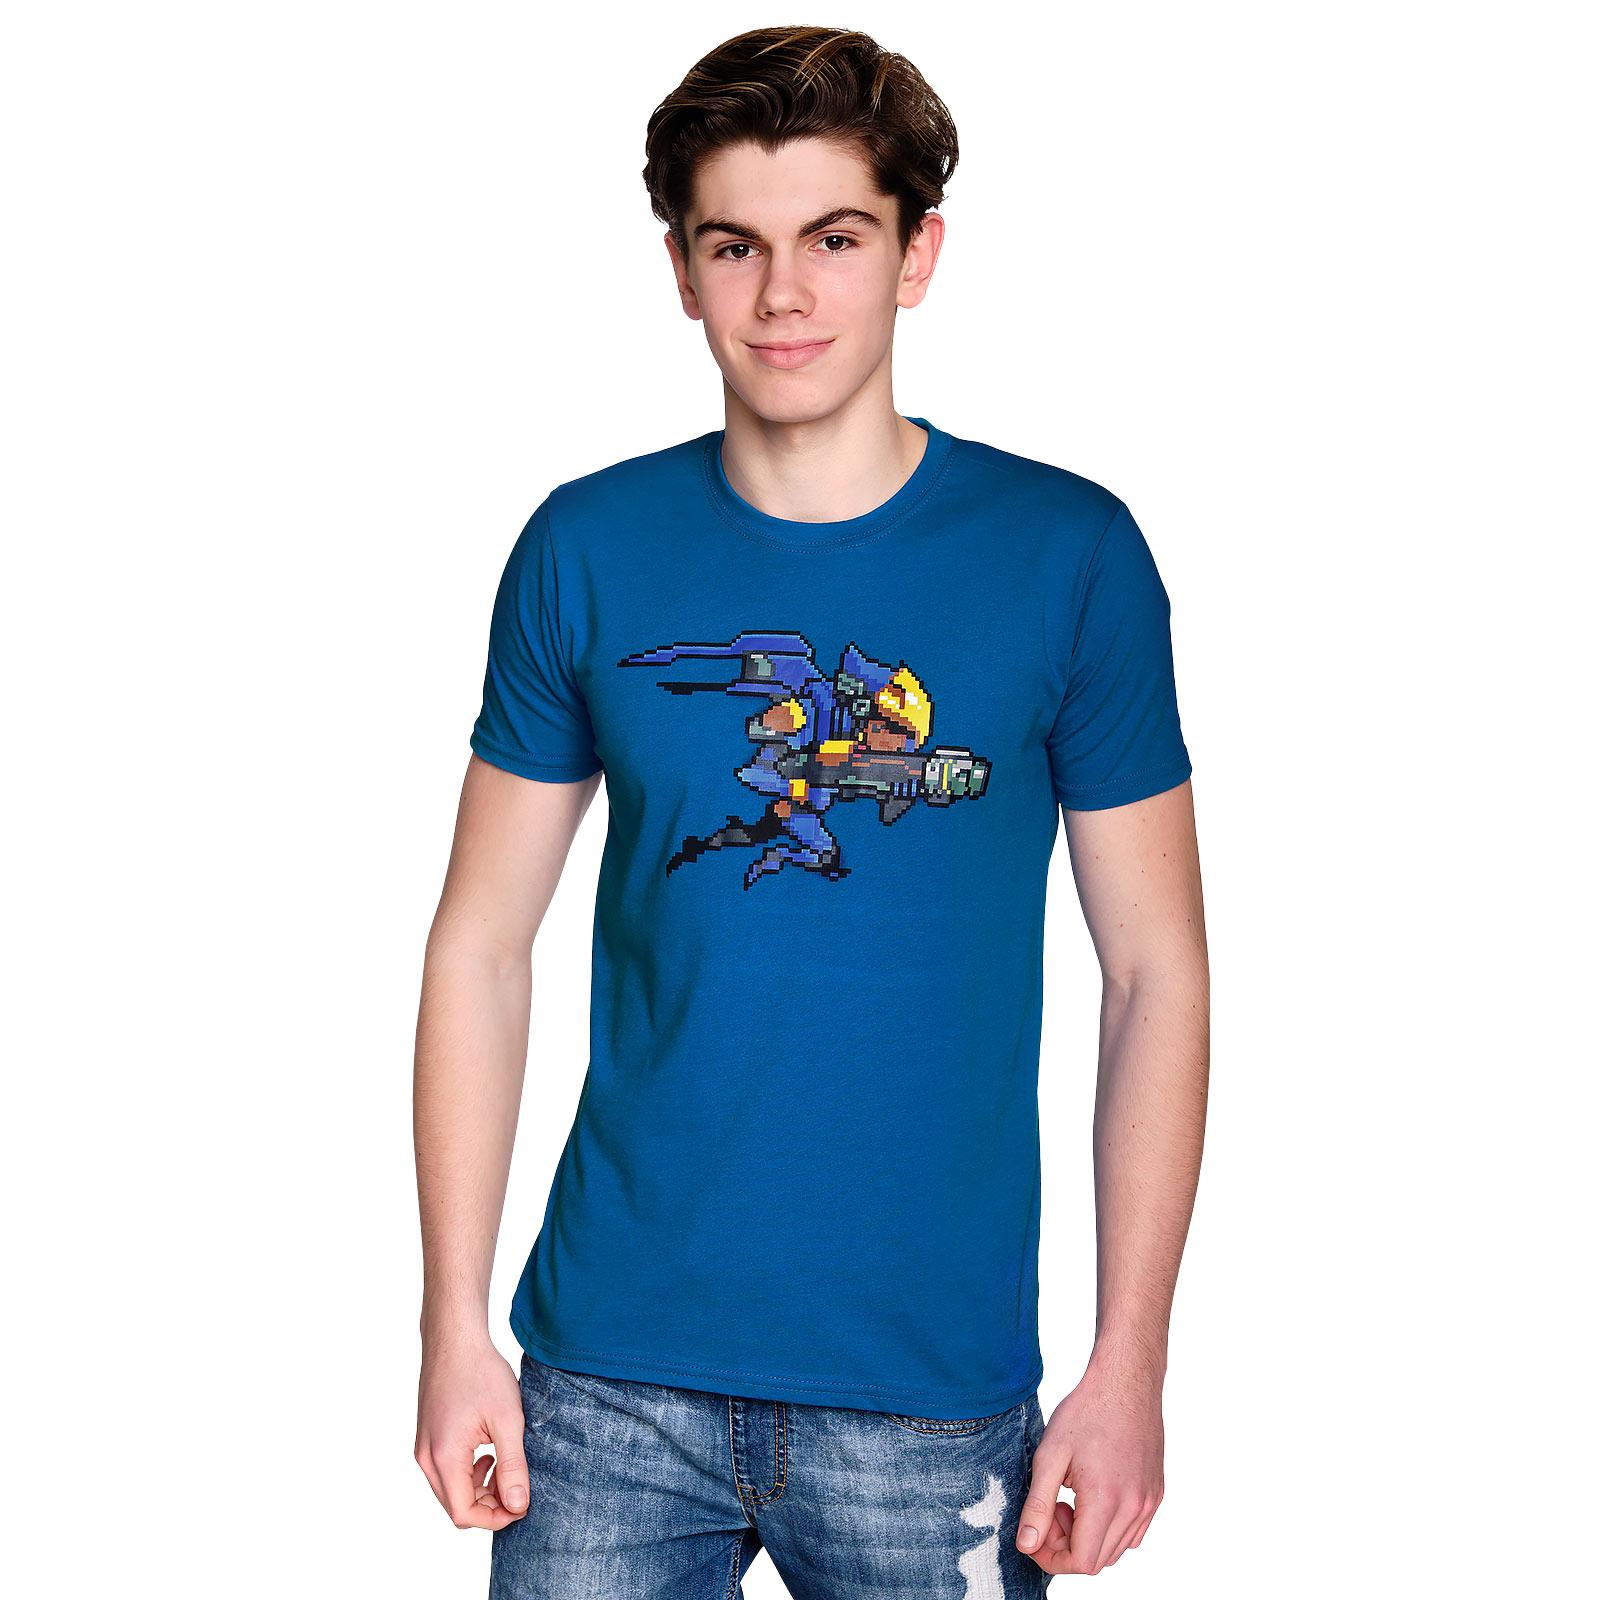 Overwatch - Pharah Pixel T-Shirt blau